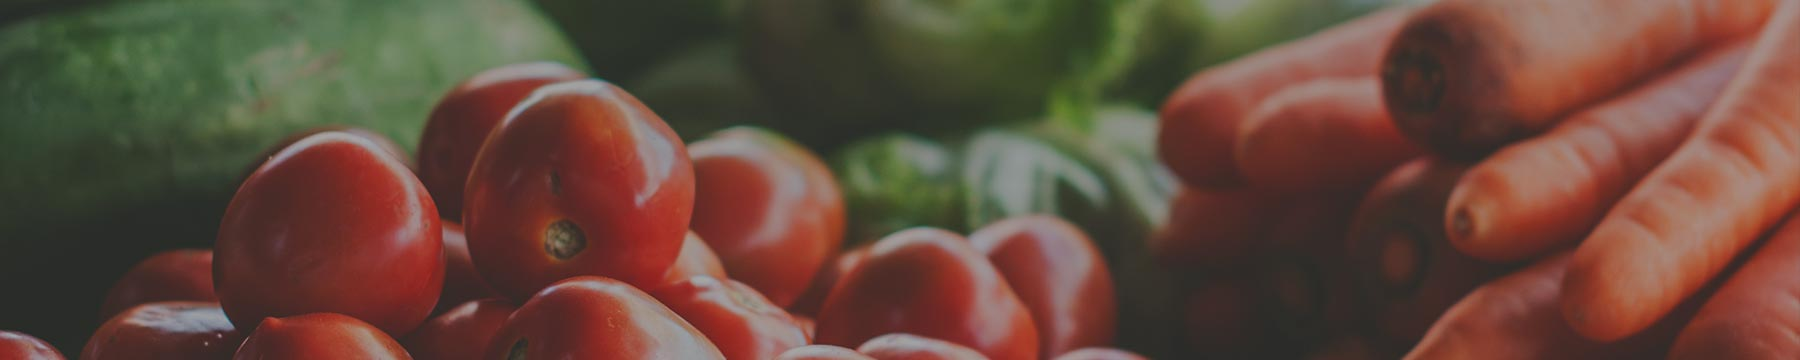 Loffredo Fresh Produce | Kansas City, Missouri